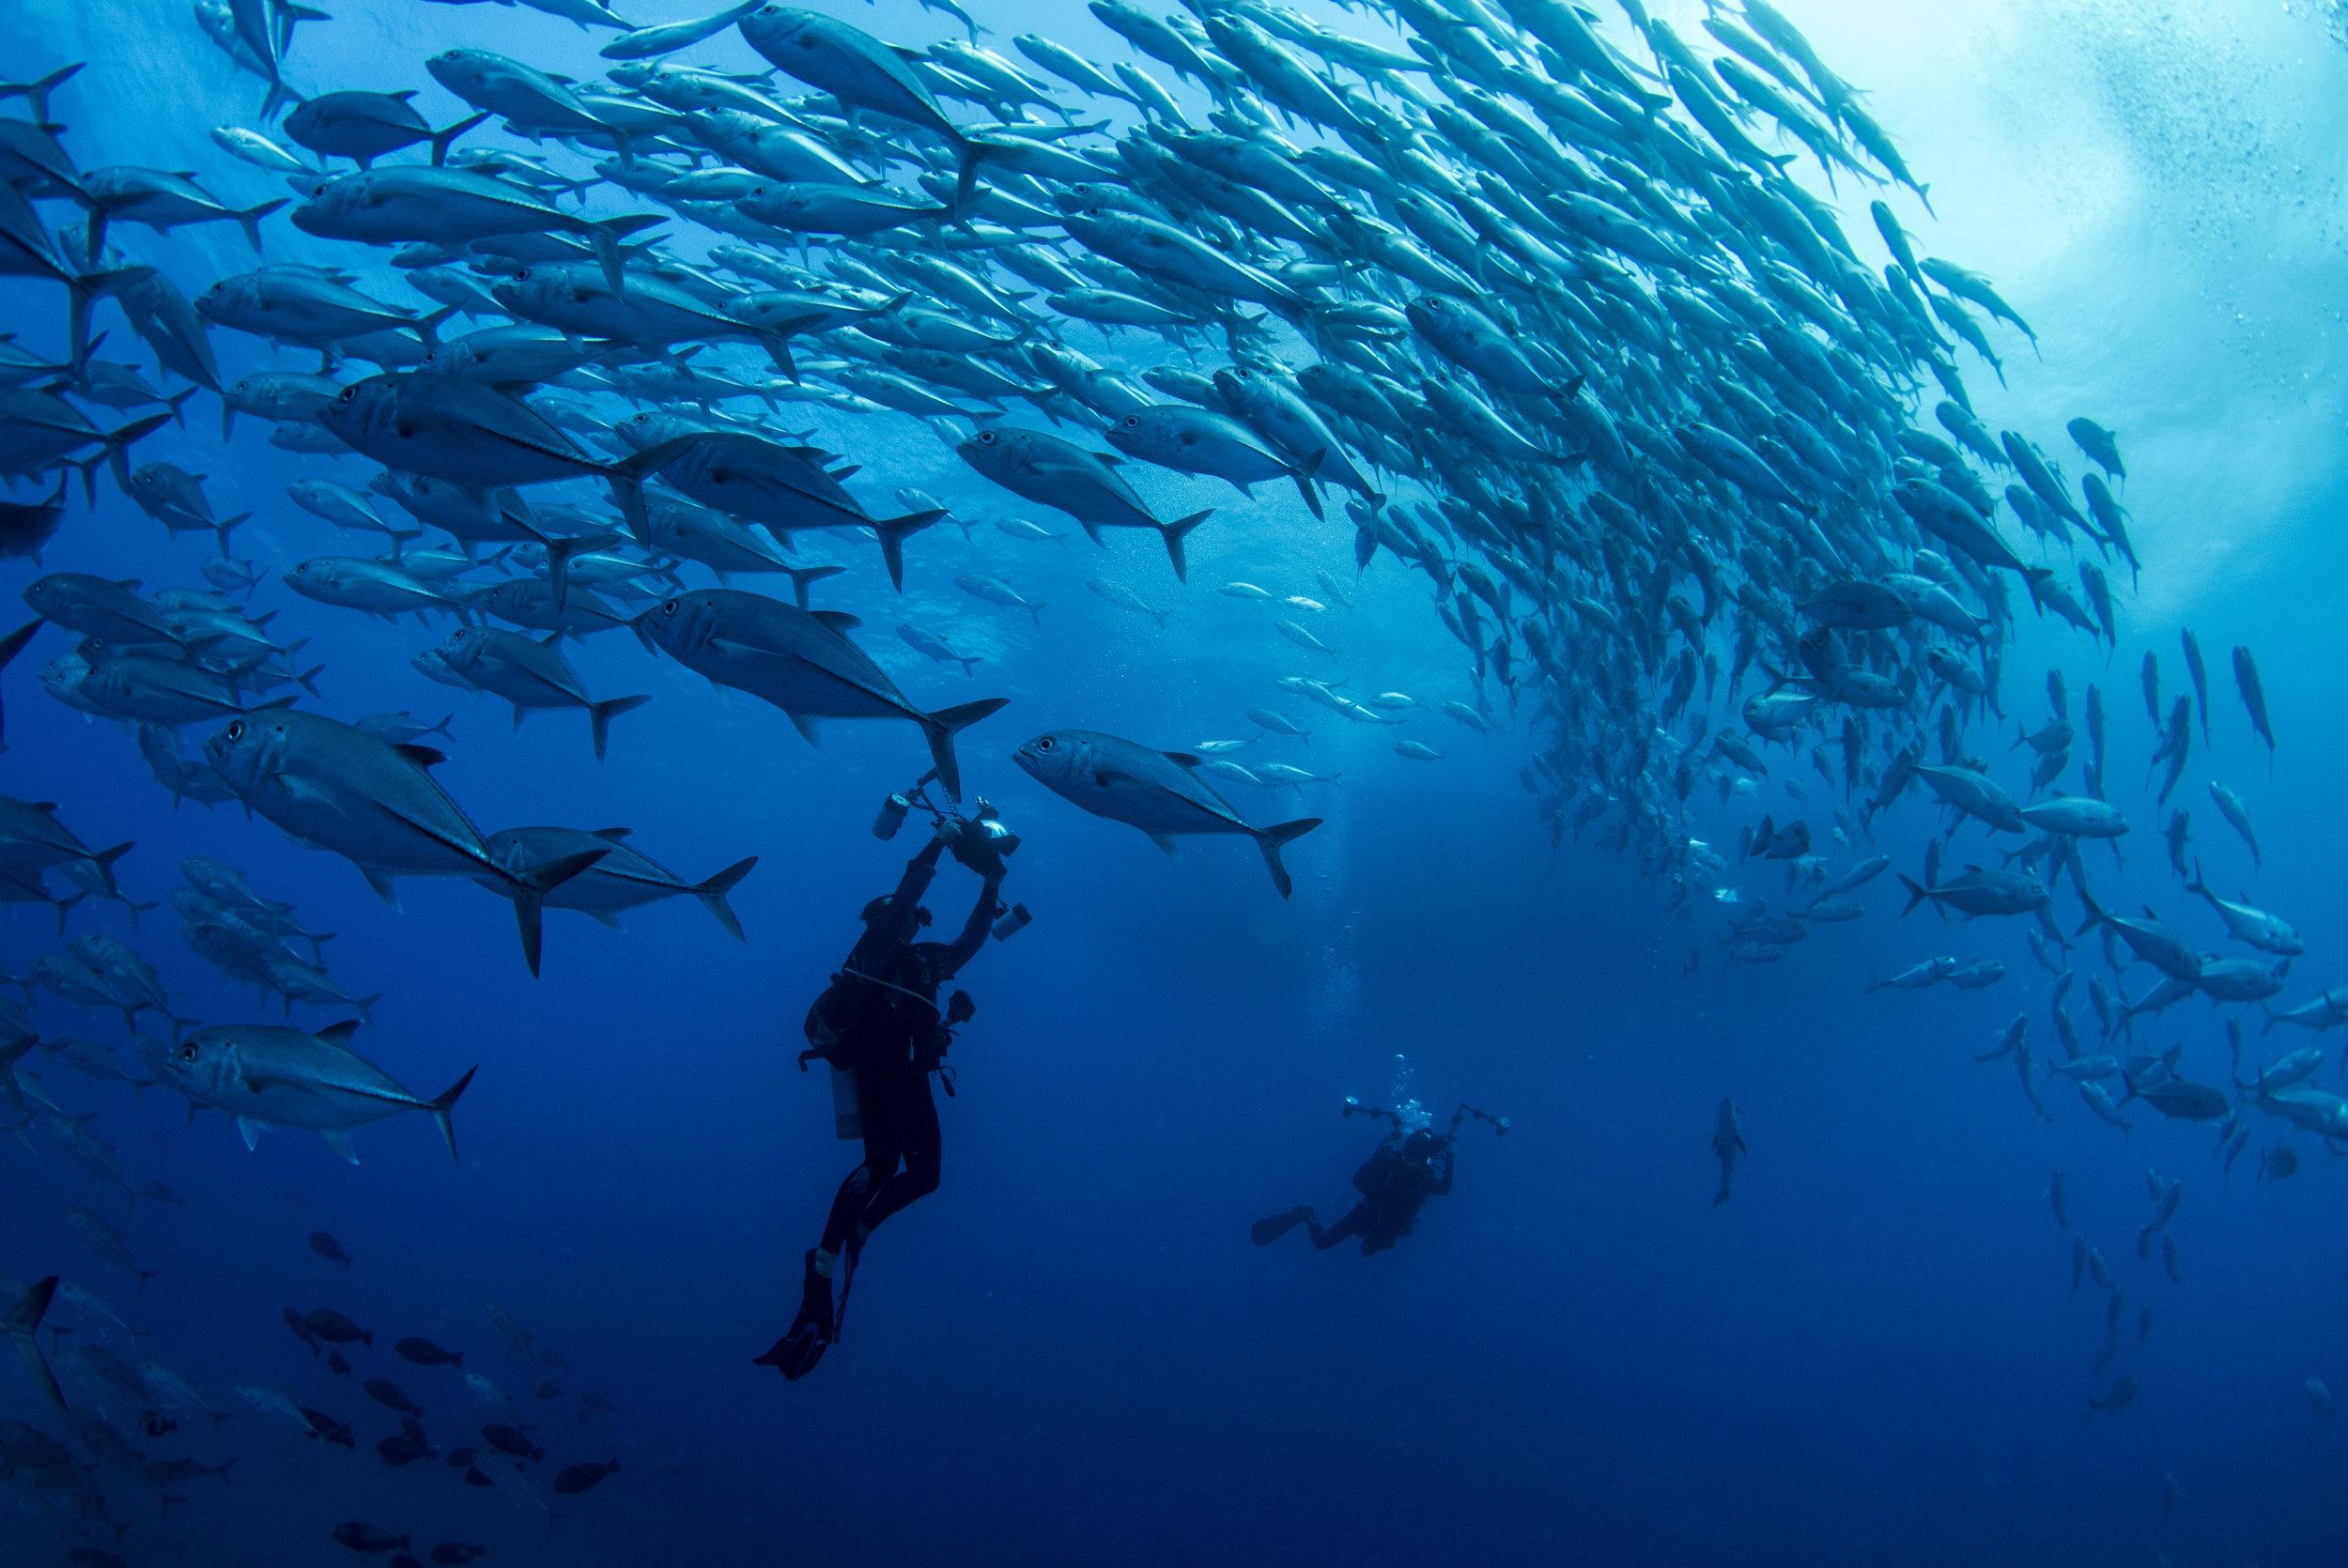 trevally school with diver amanda cotton/ coral reef image bank